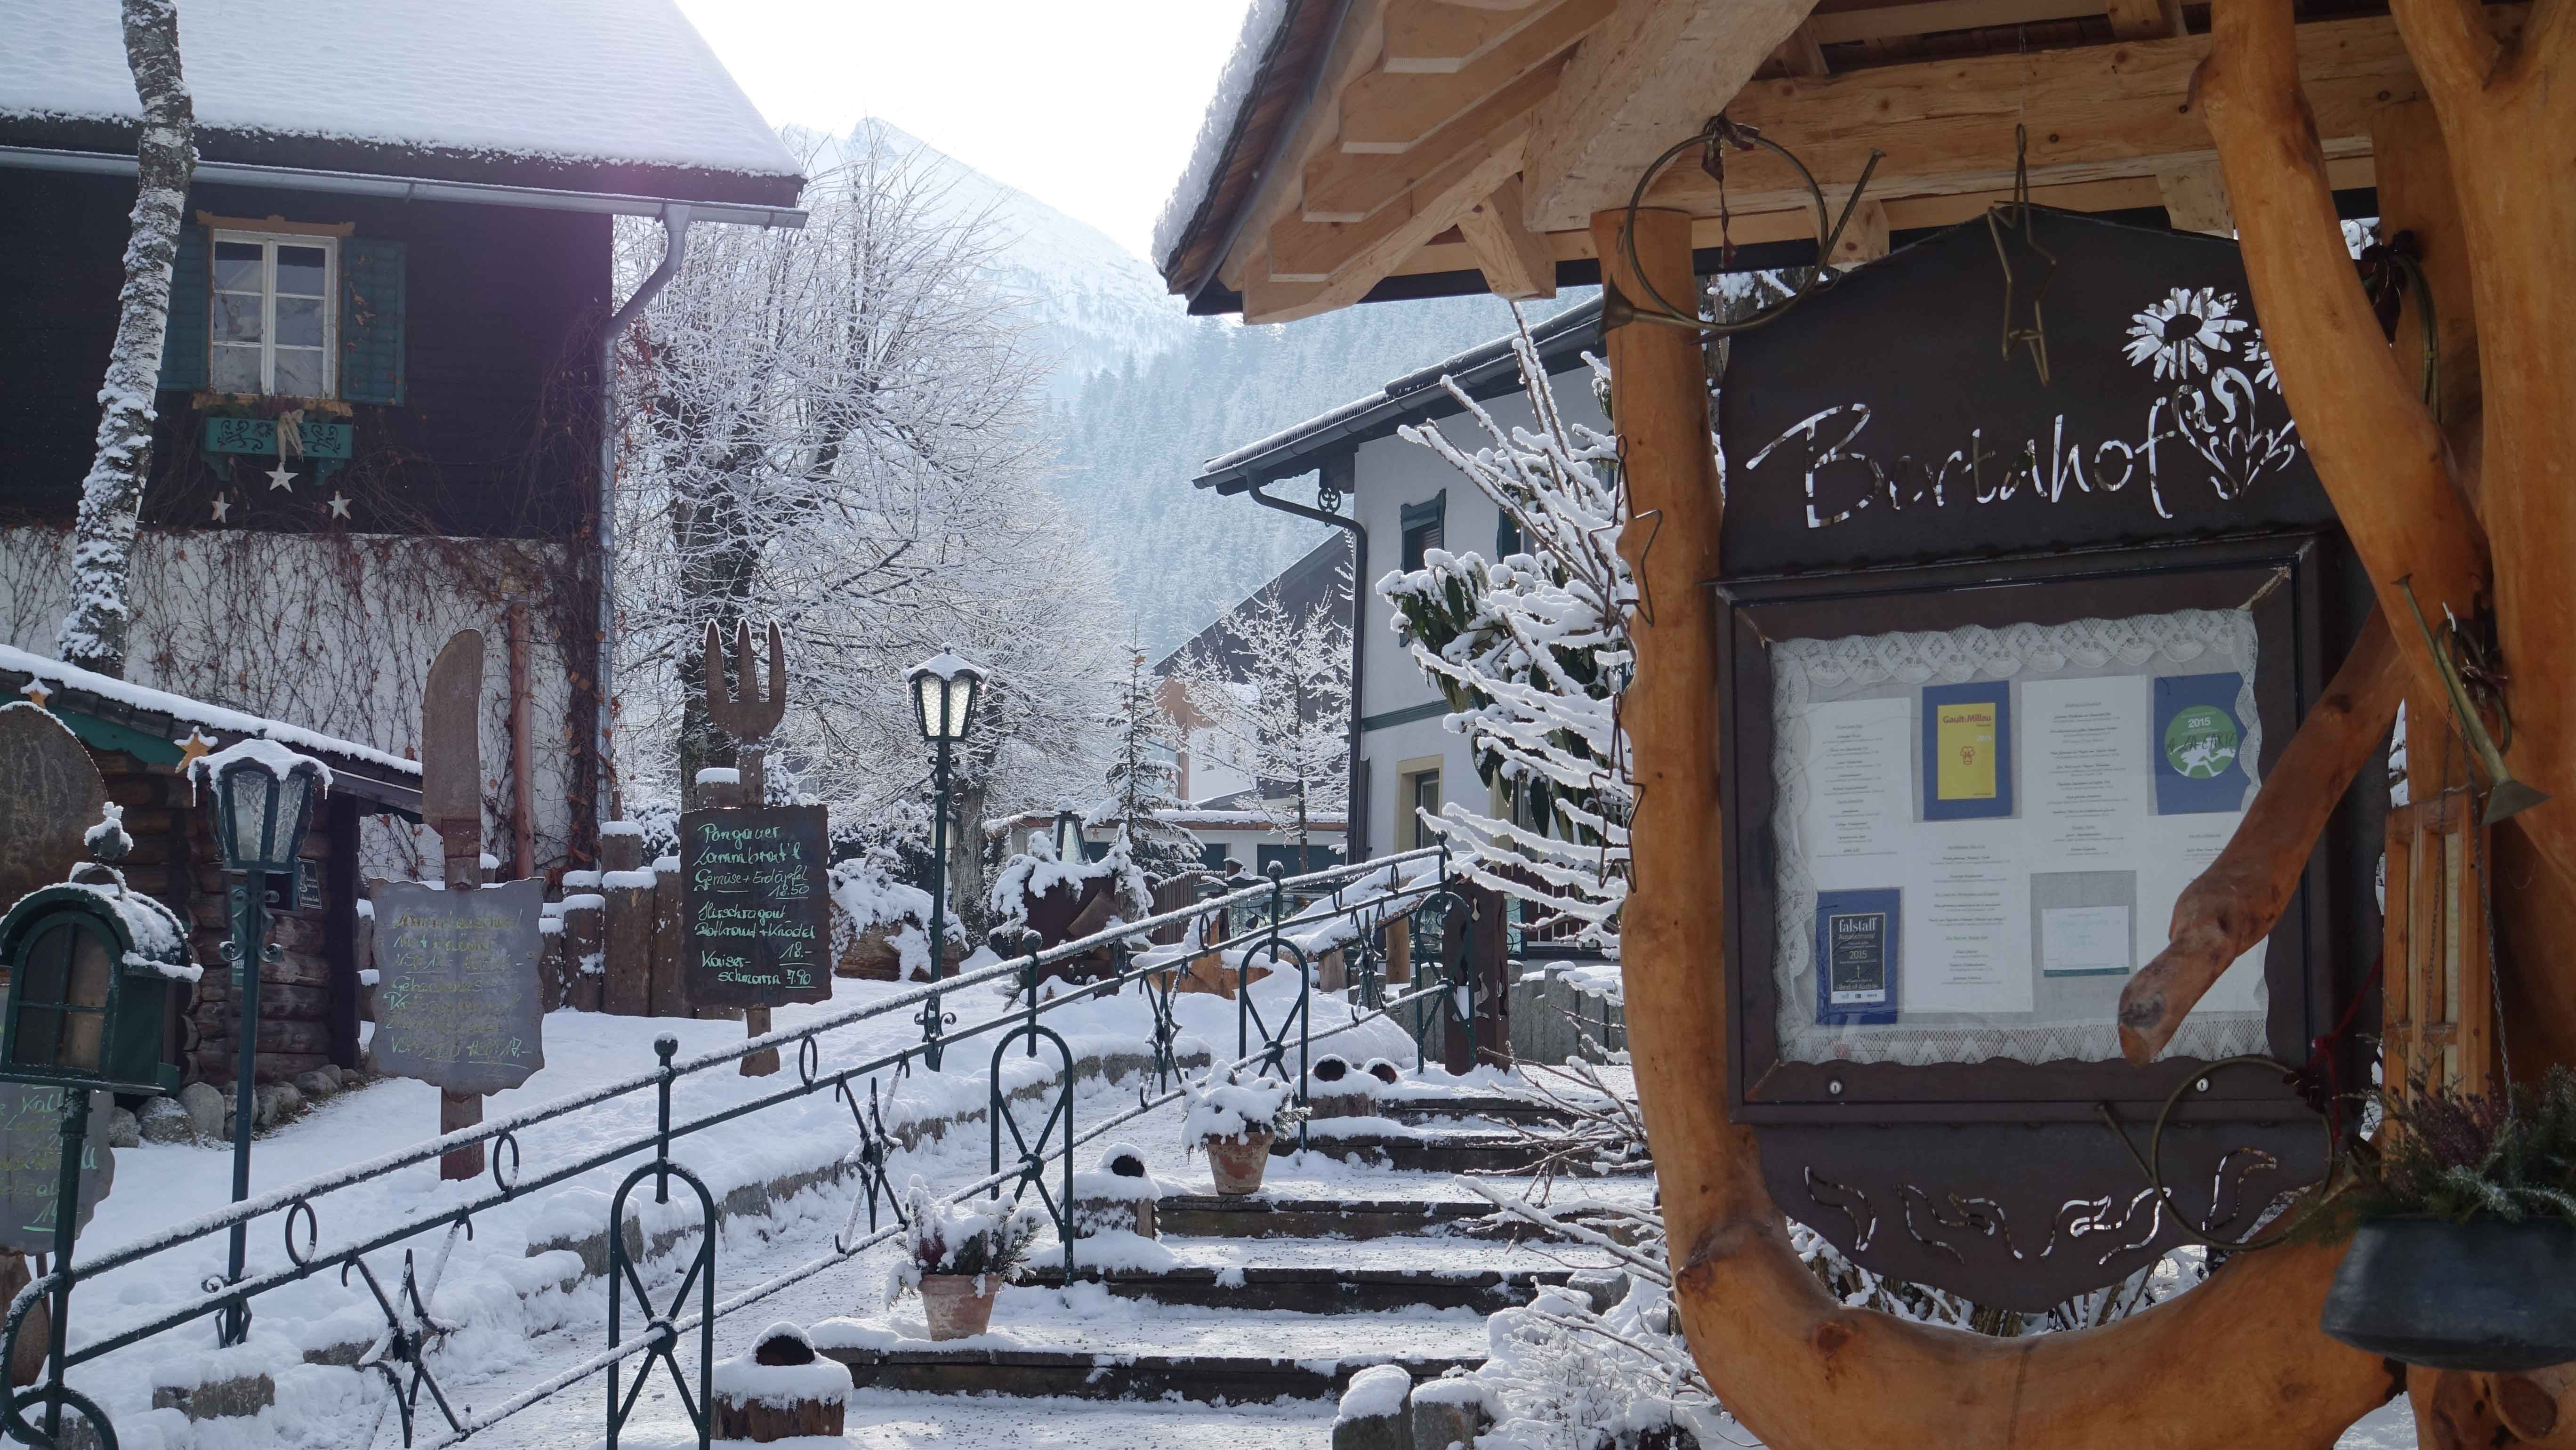 Bertahof Winter 7.JPG